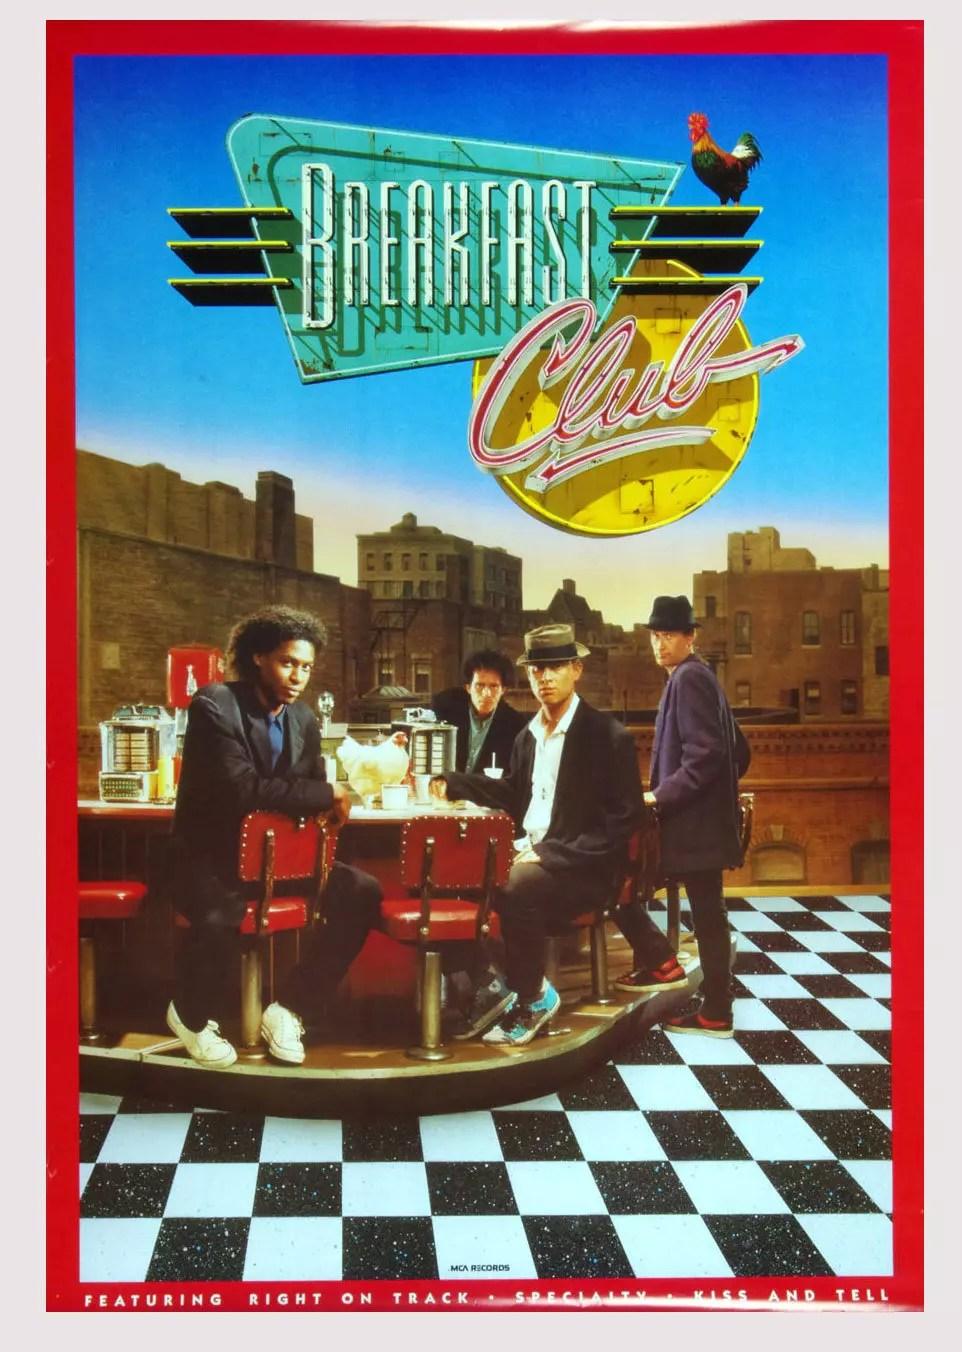 Breakfast Club Poster self titled 1987 New Album Promo 24 x 36